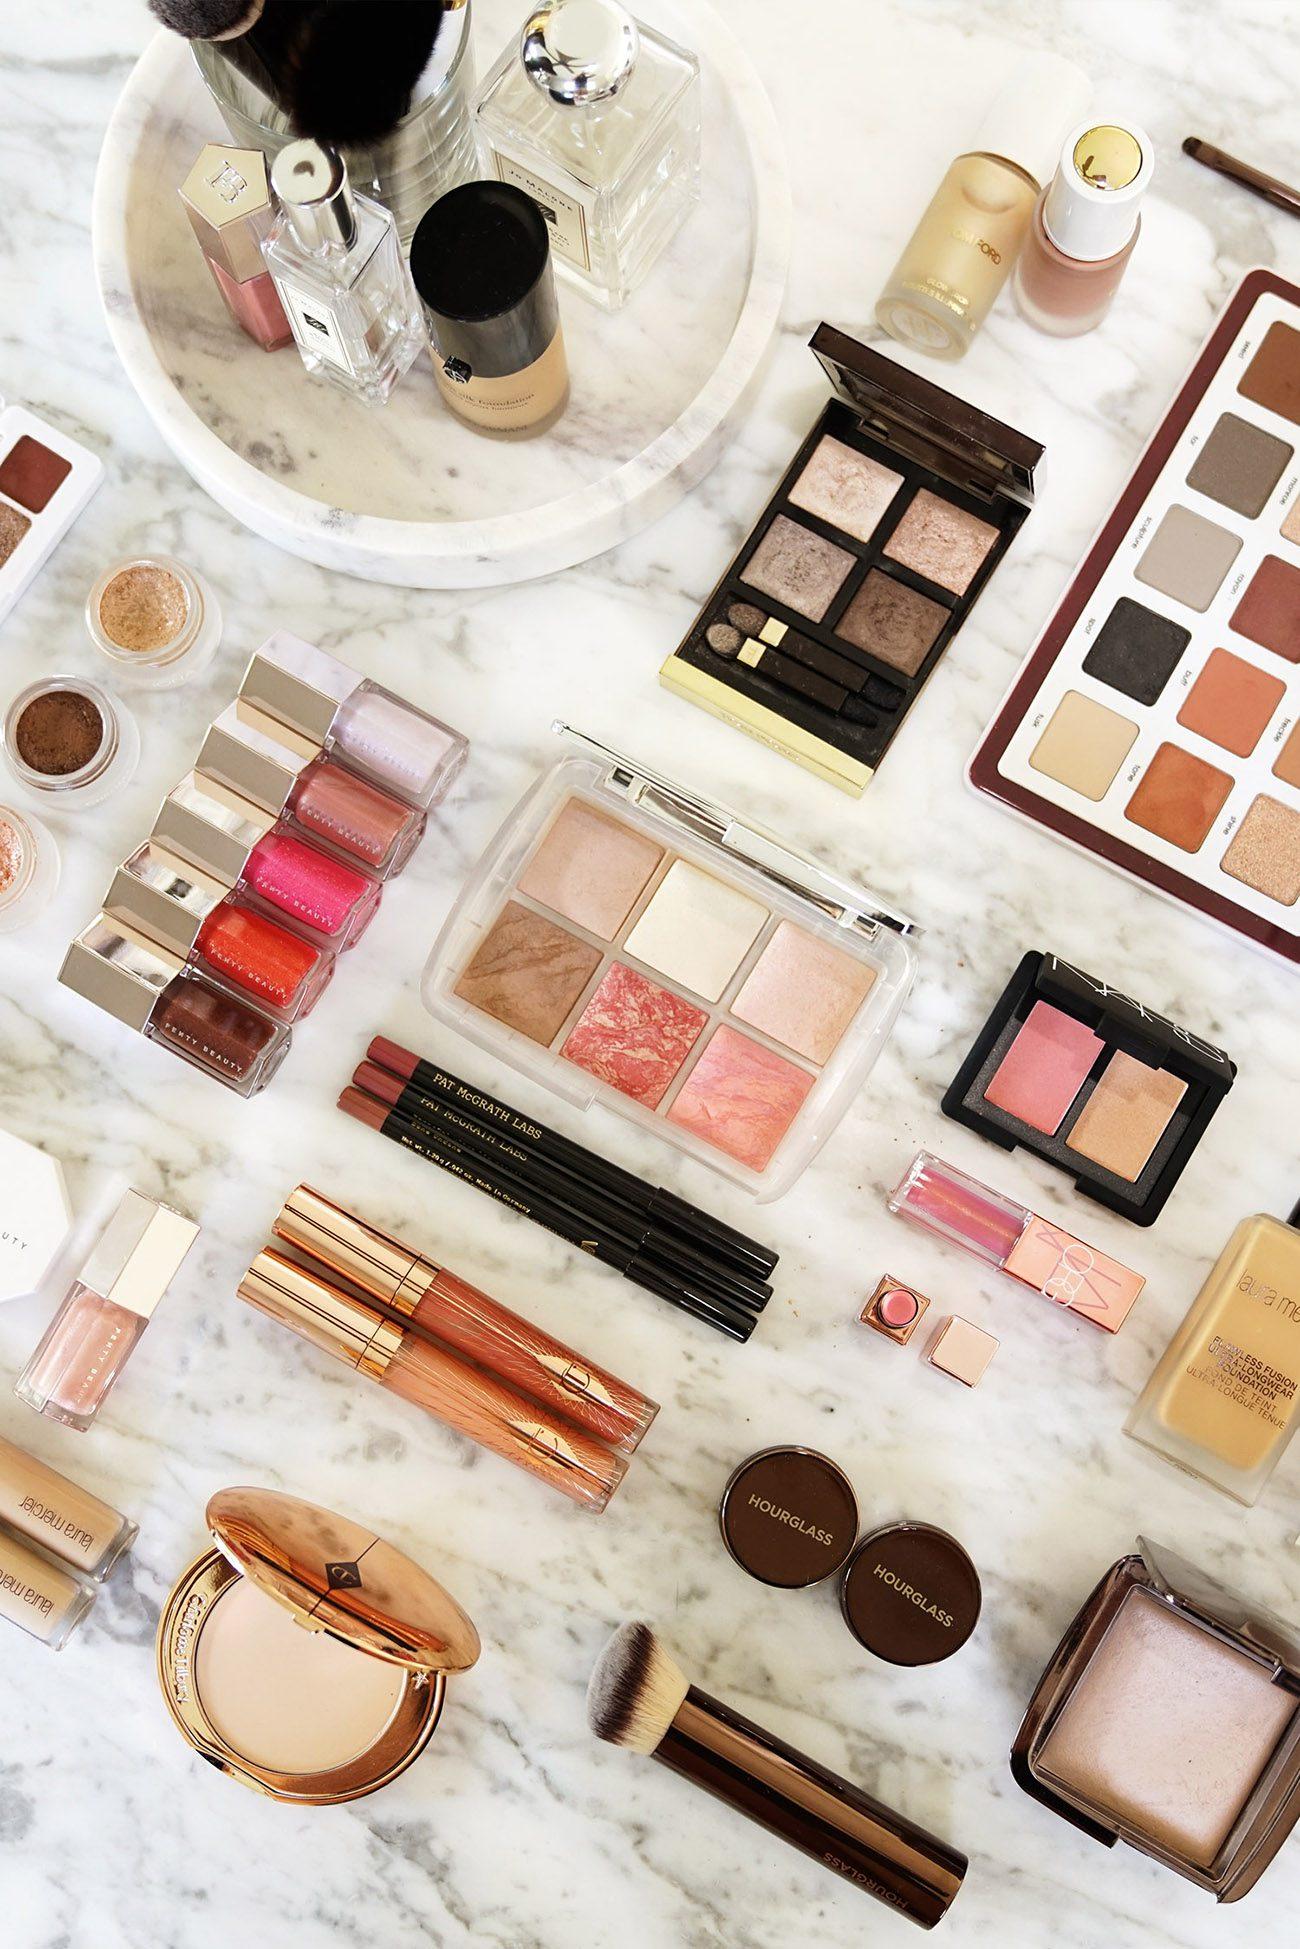 Meilleur maquillage chez Sephora: Sablier, Natasha Denona, Tom Ford, NARS